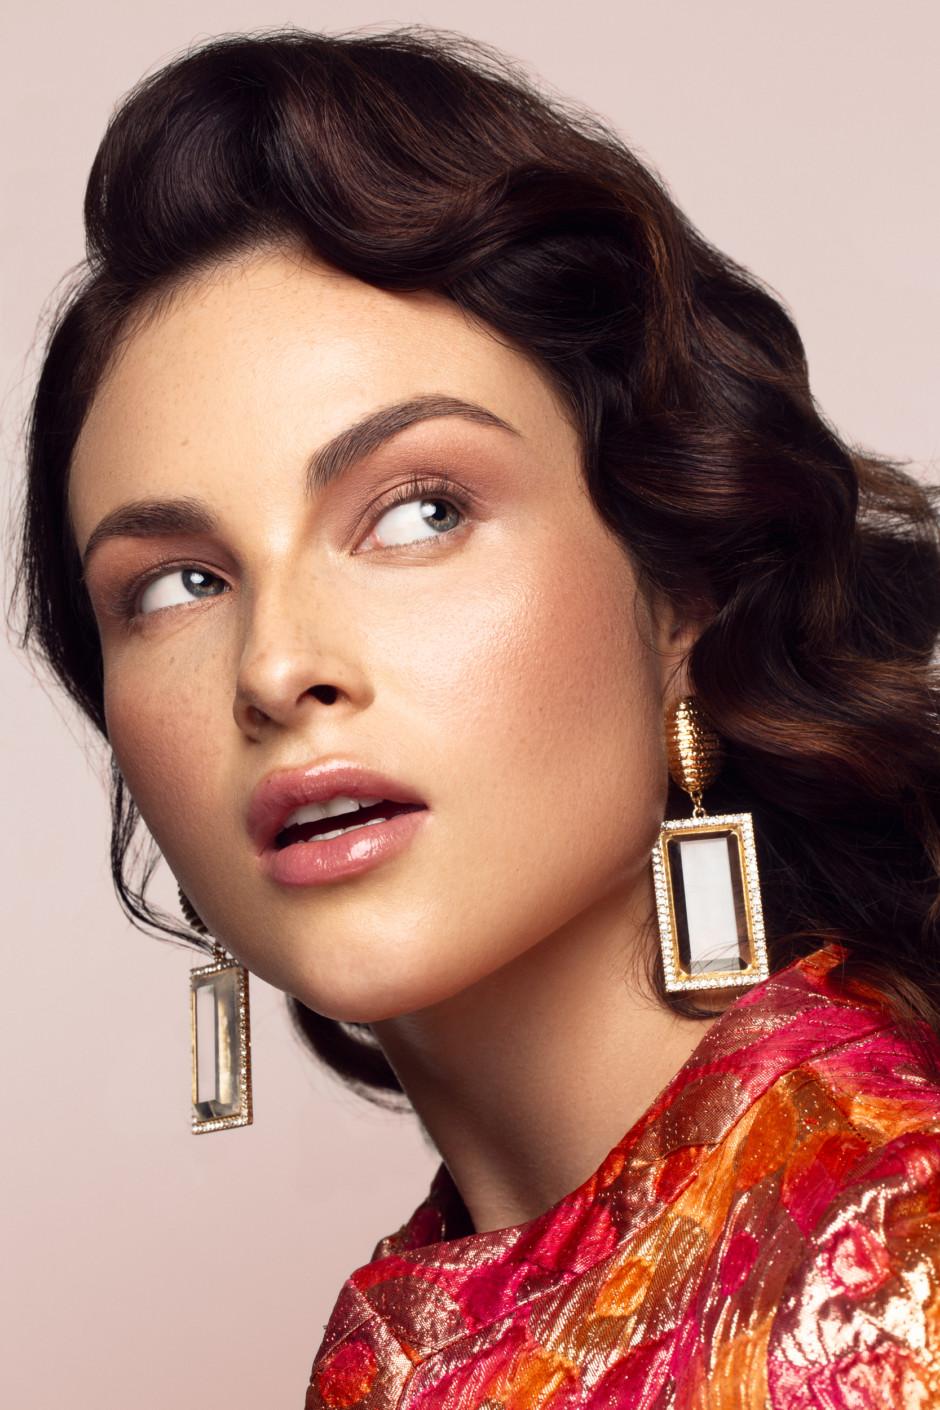 Nicole Beauty Fashion Low Res-7